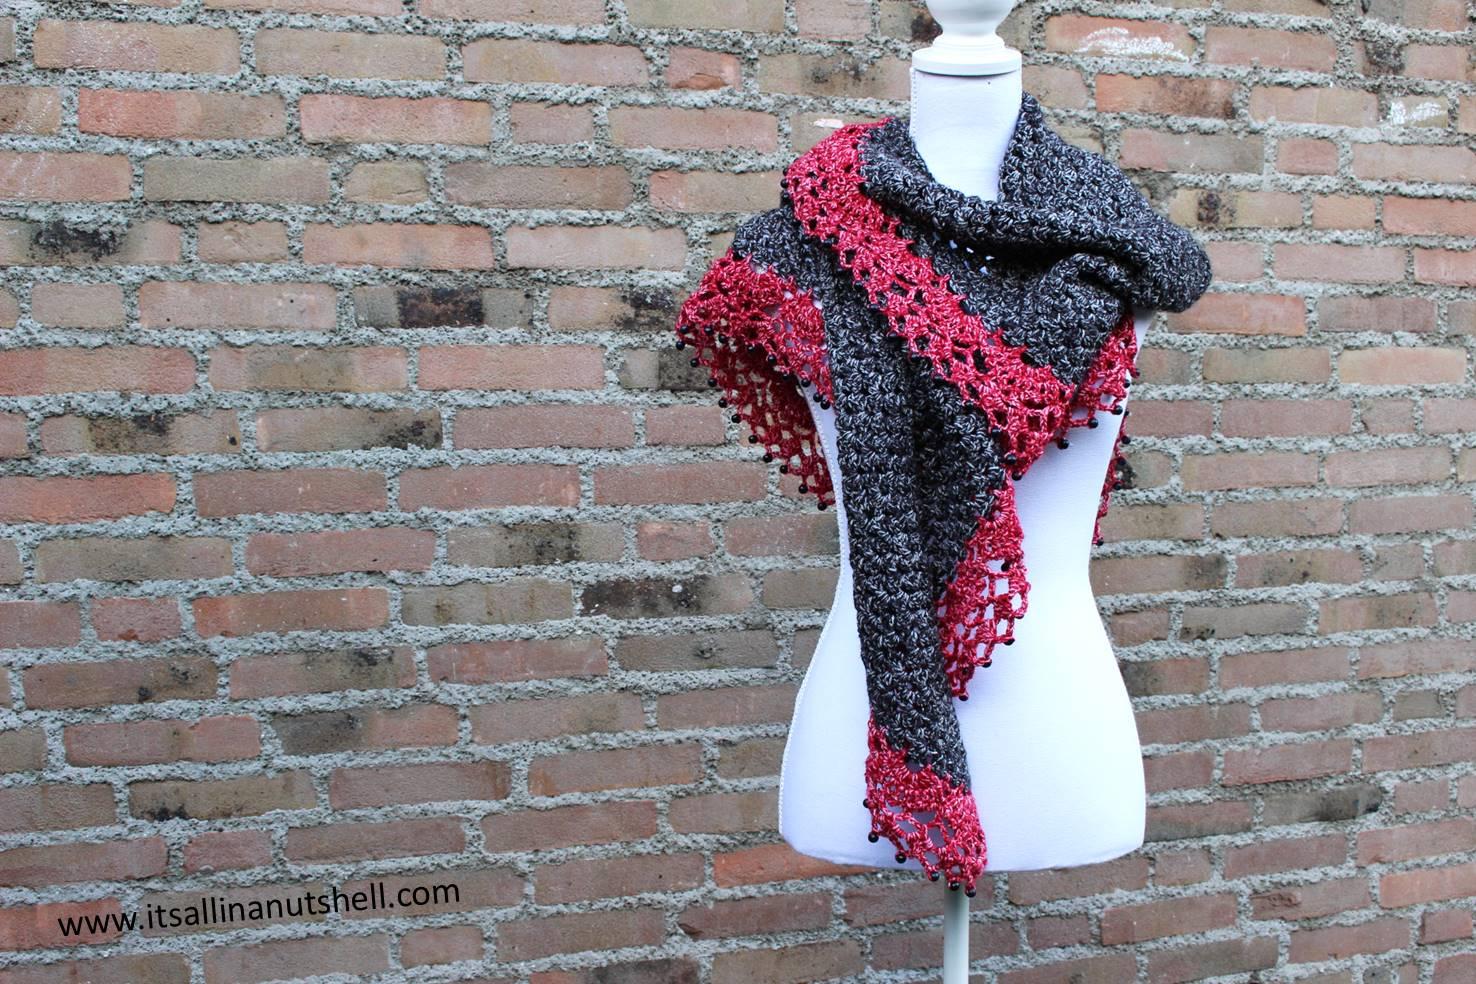 Touch Of Velvet Wrap Free Crochet Pattern Its All In A Nutshell